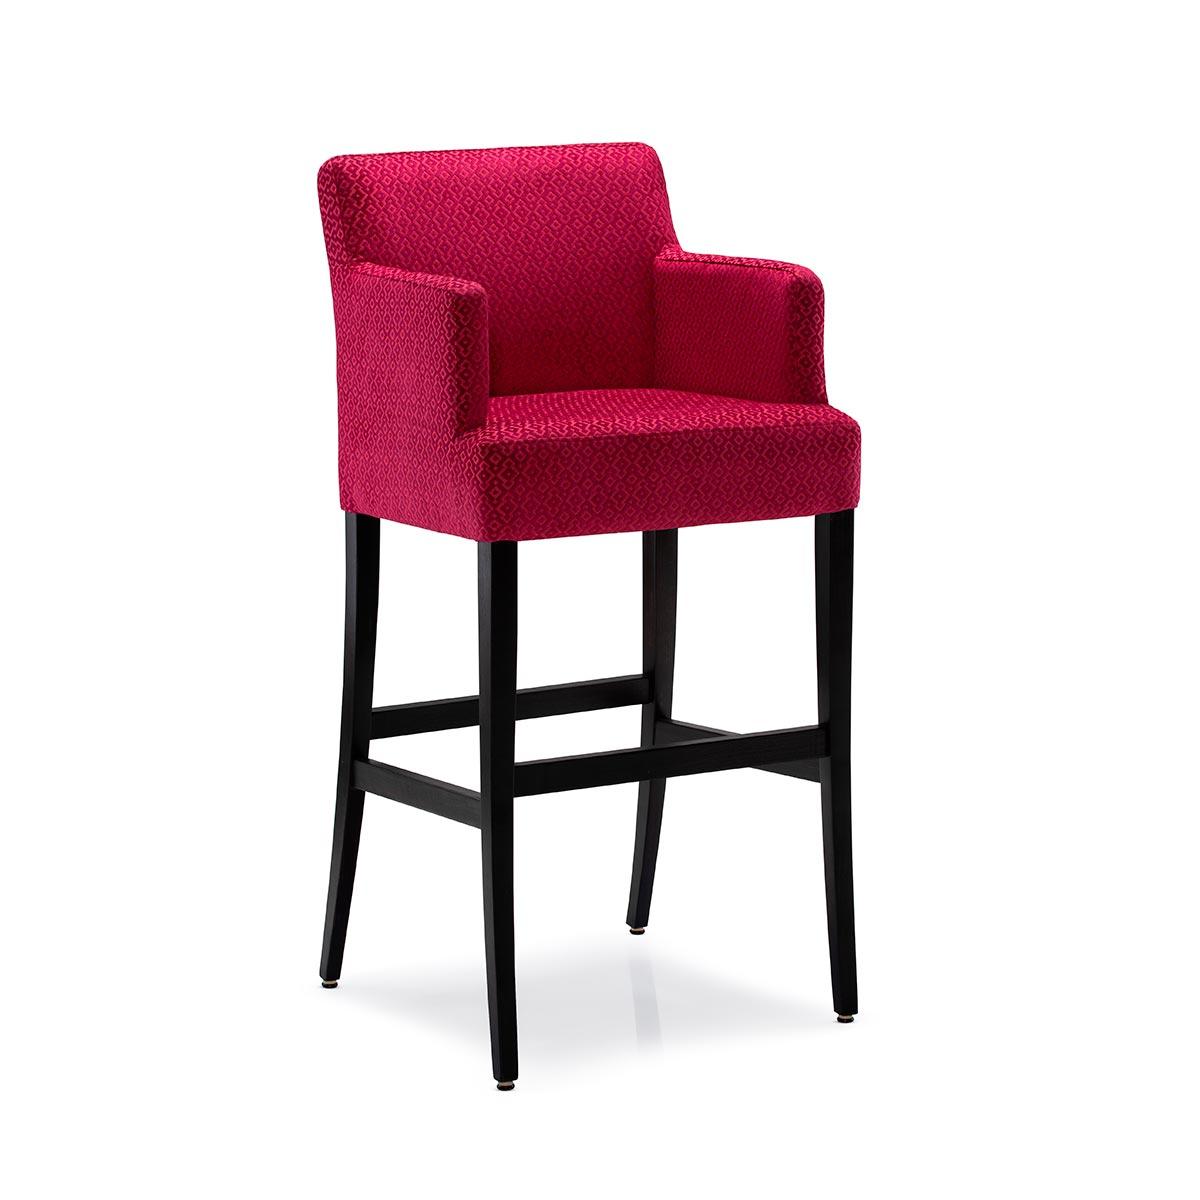 Apple Arm Bar - Barske stolice sa rukonaslonom - Detal nameštaj